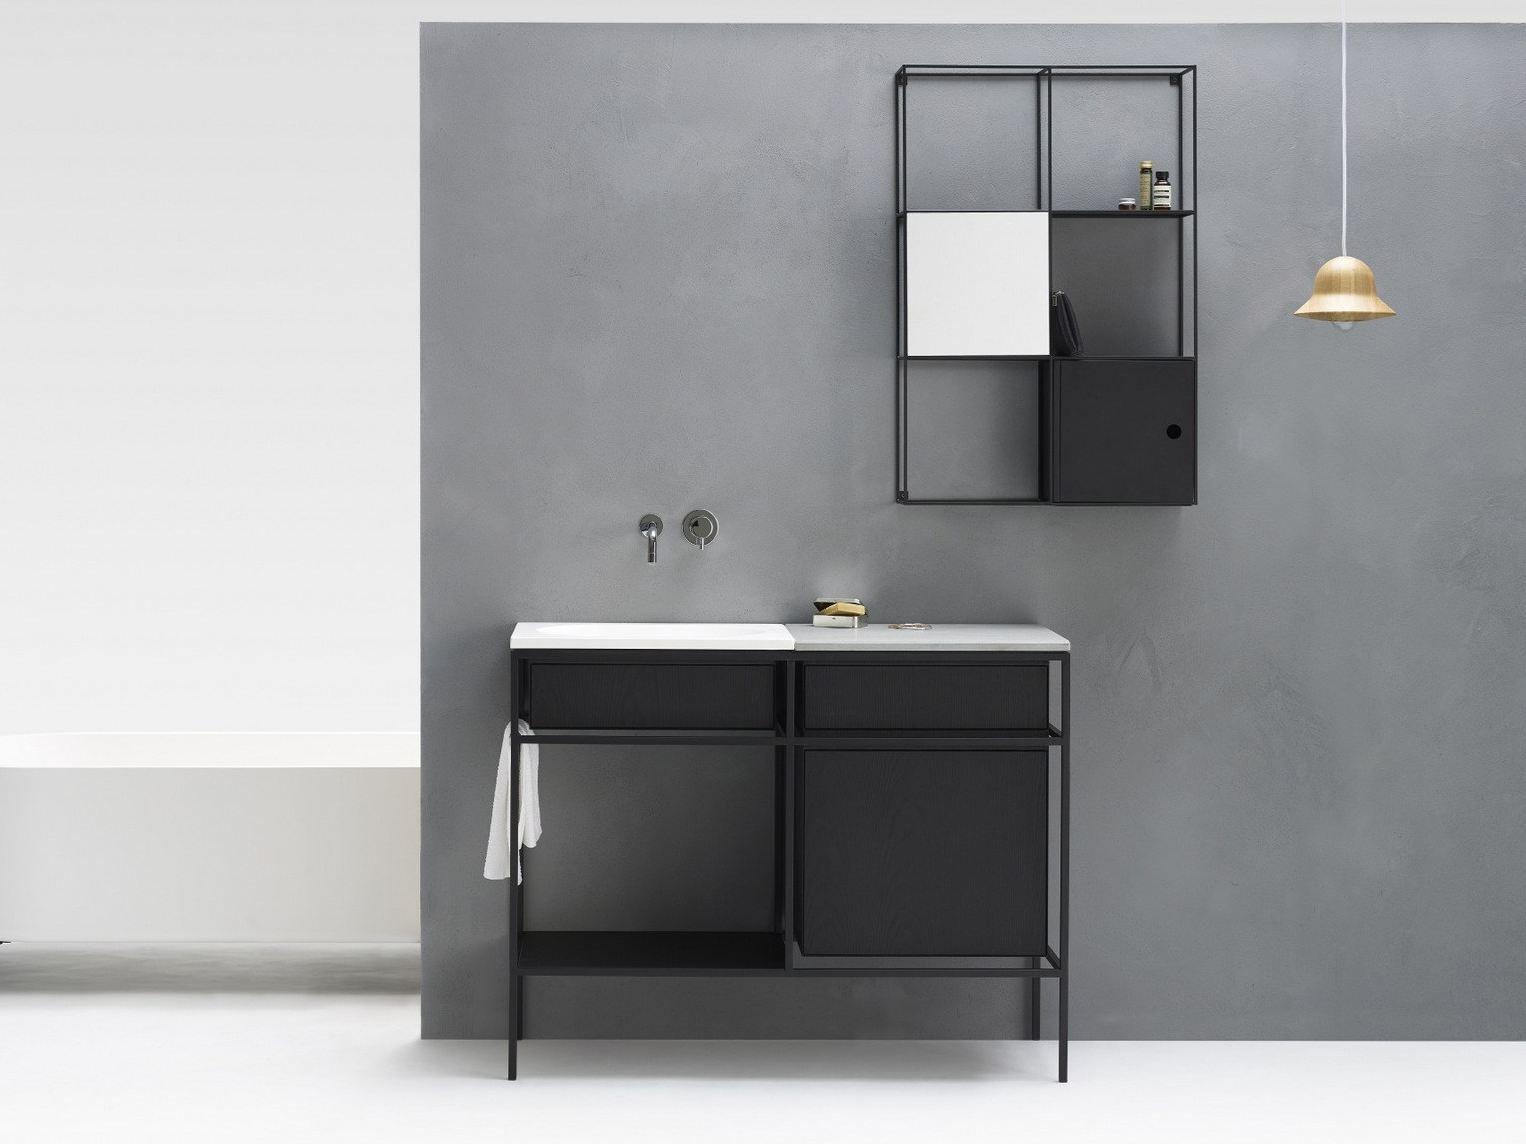 mueble bajo lavabo con cajones frame by ex.t diseño norm, Badezimmer ideen